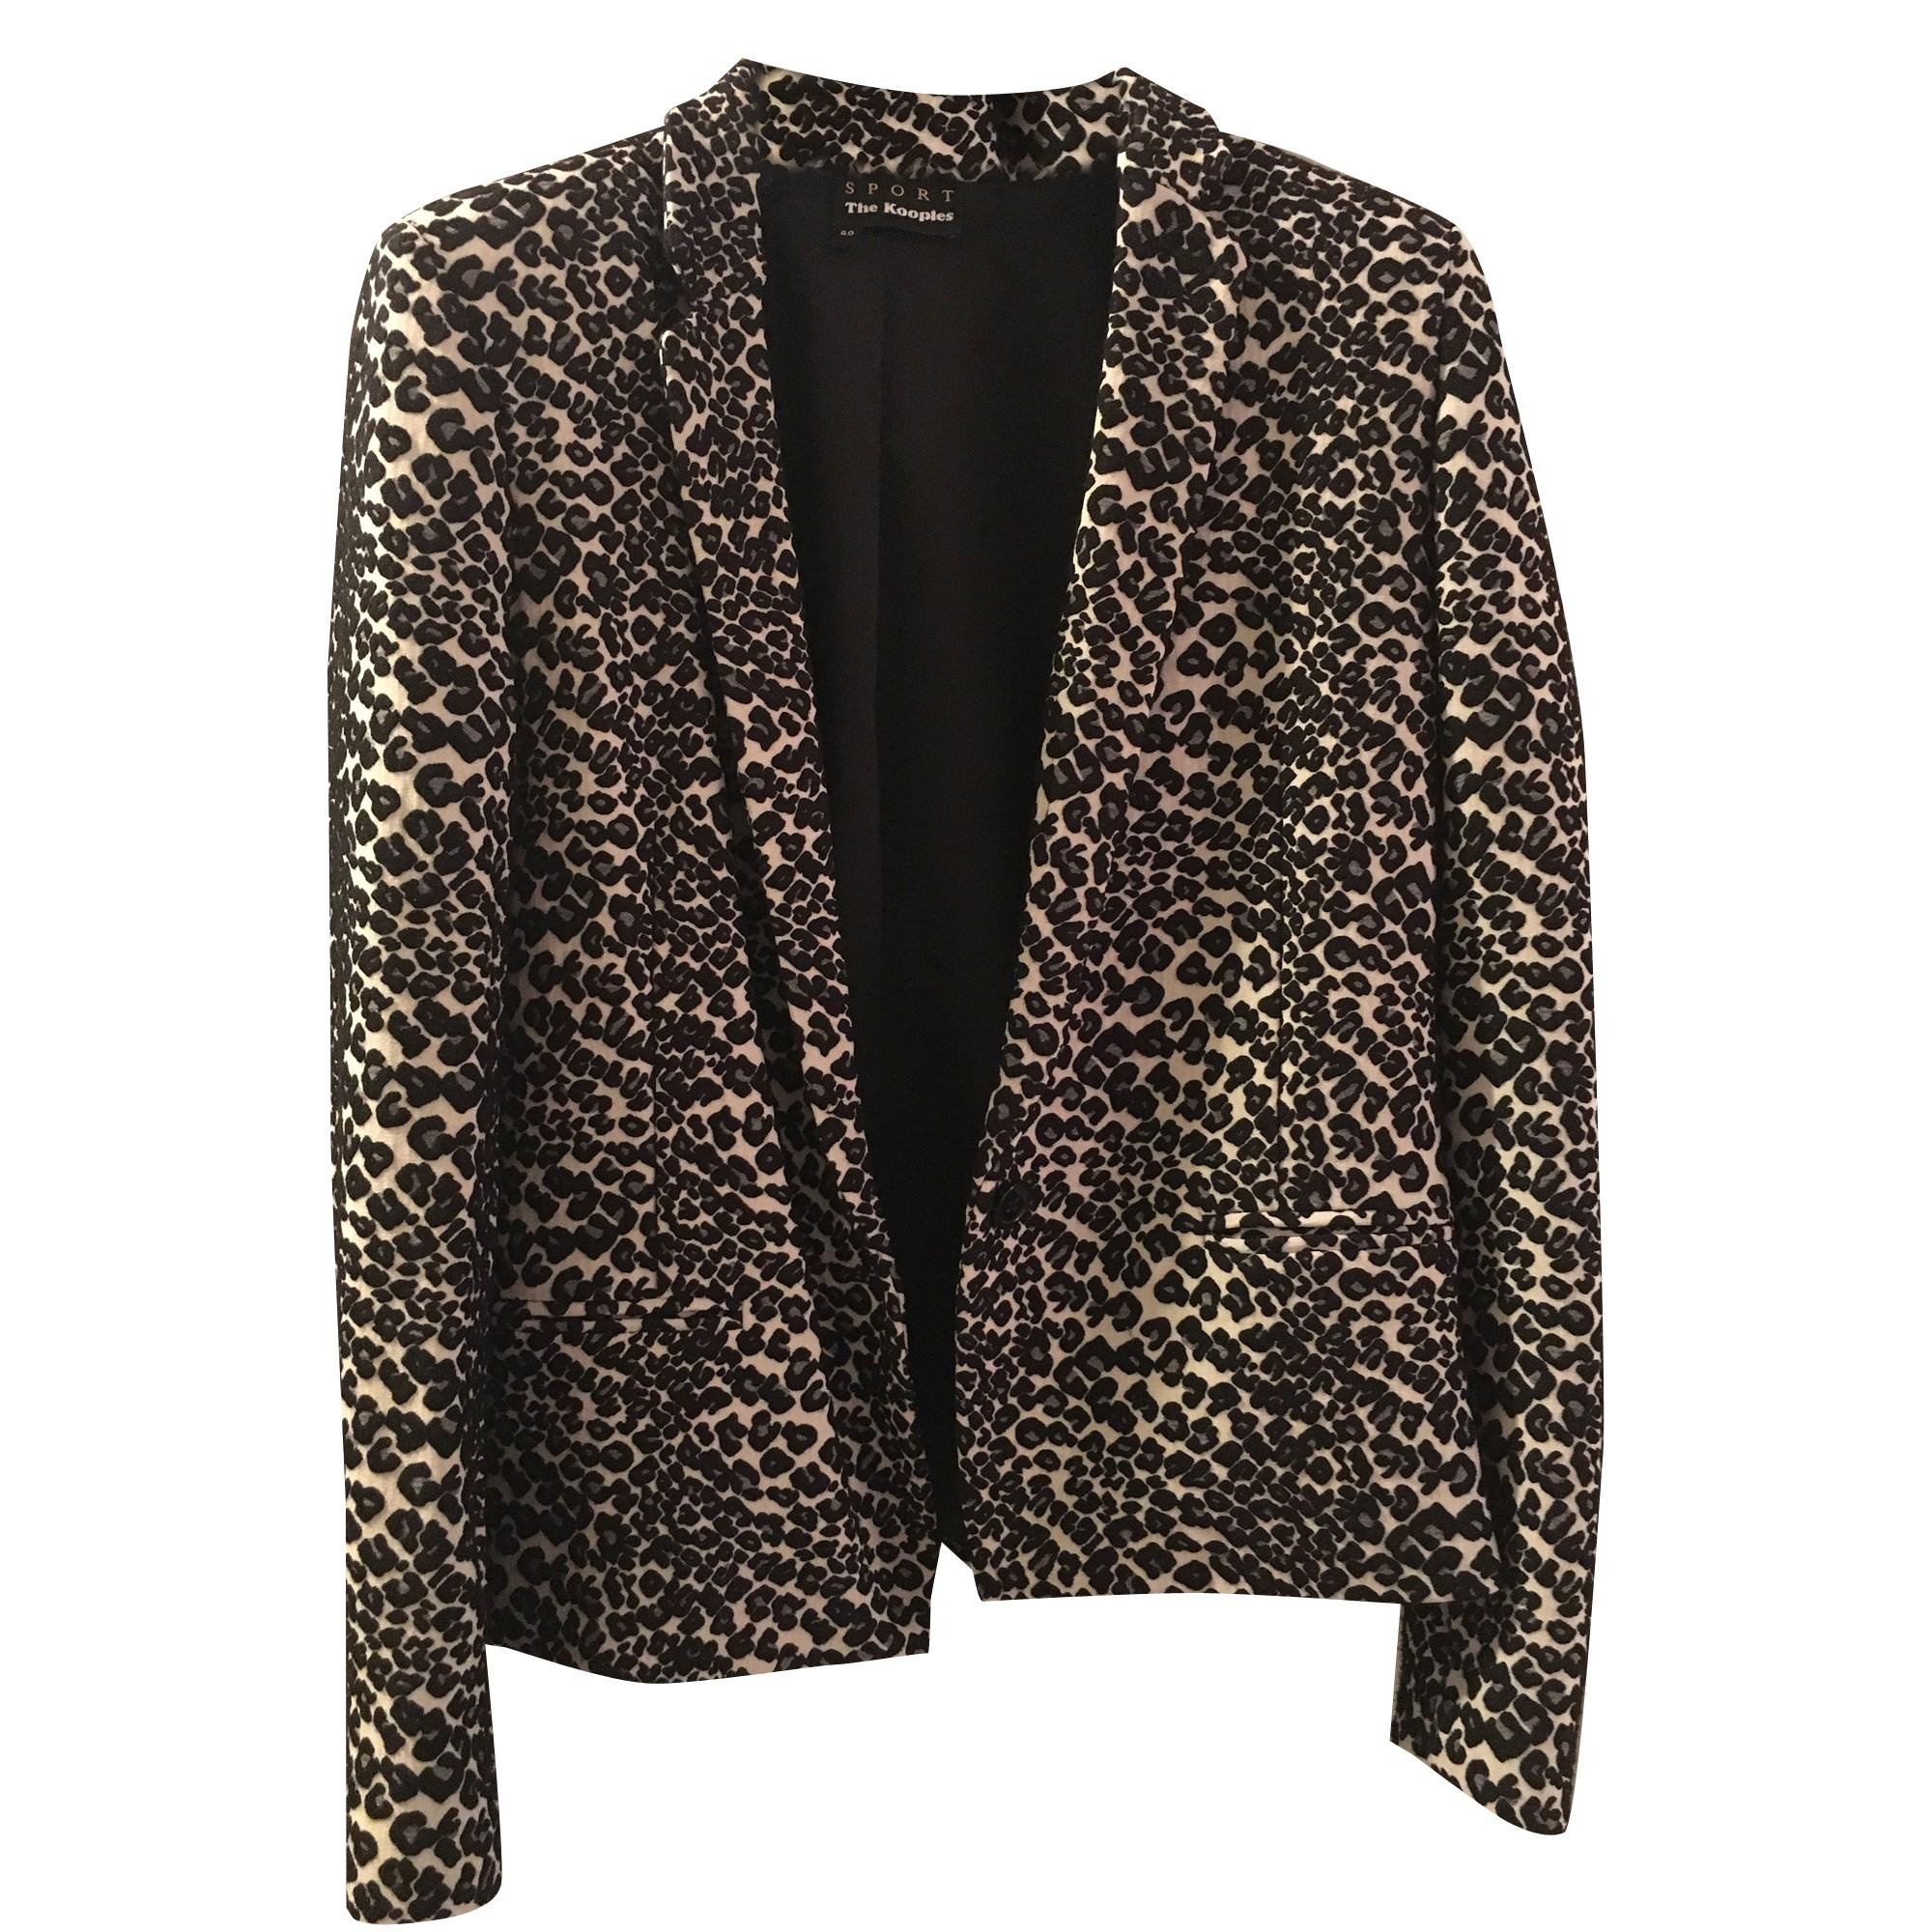 Veste tailleur leopard femme